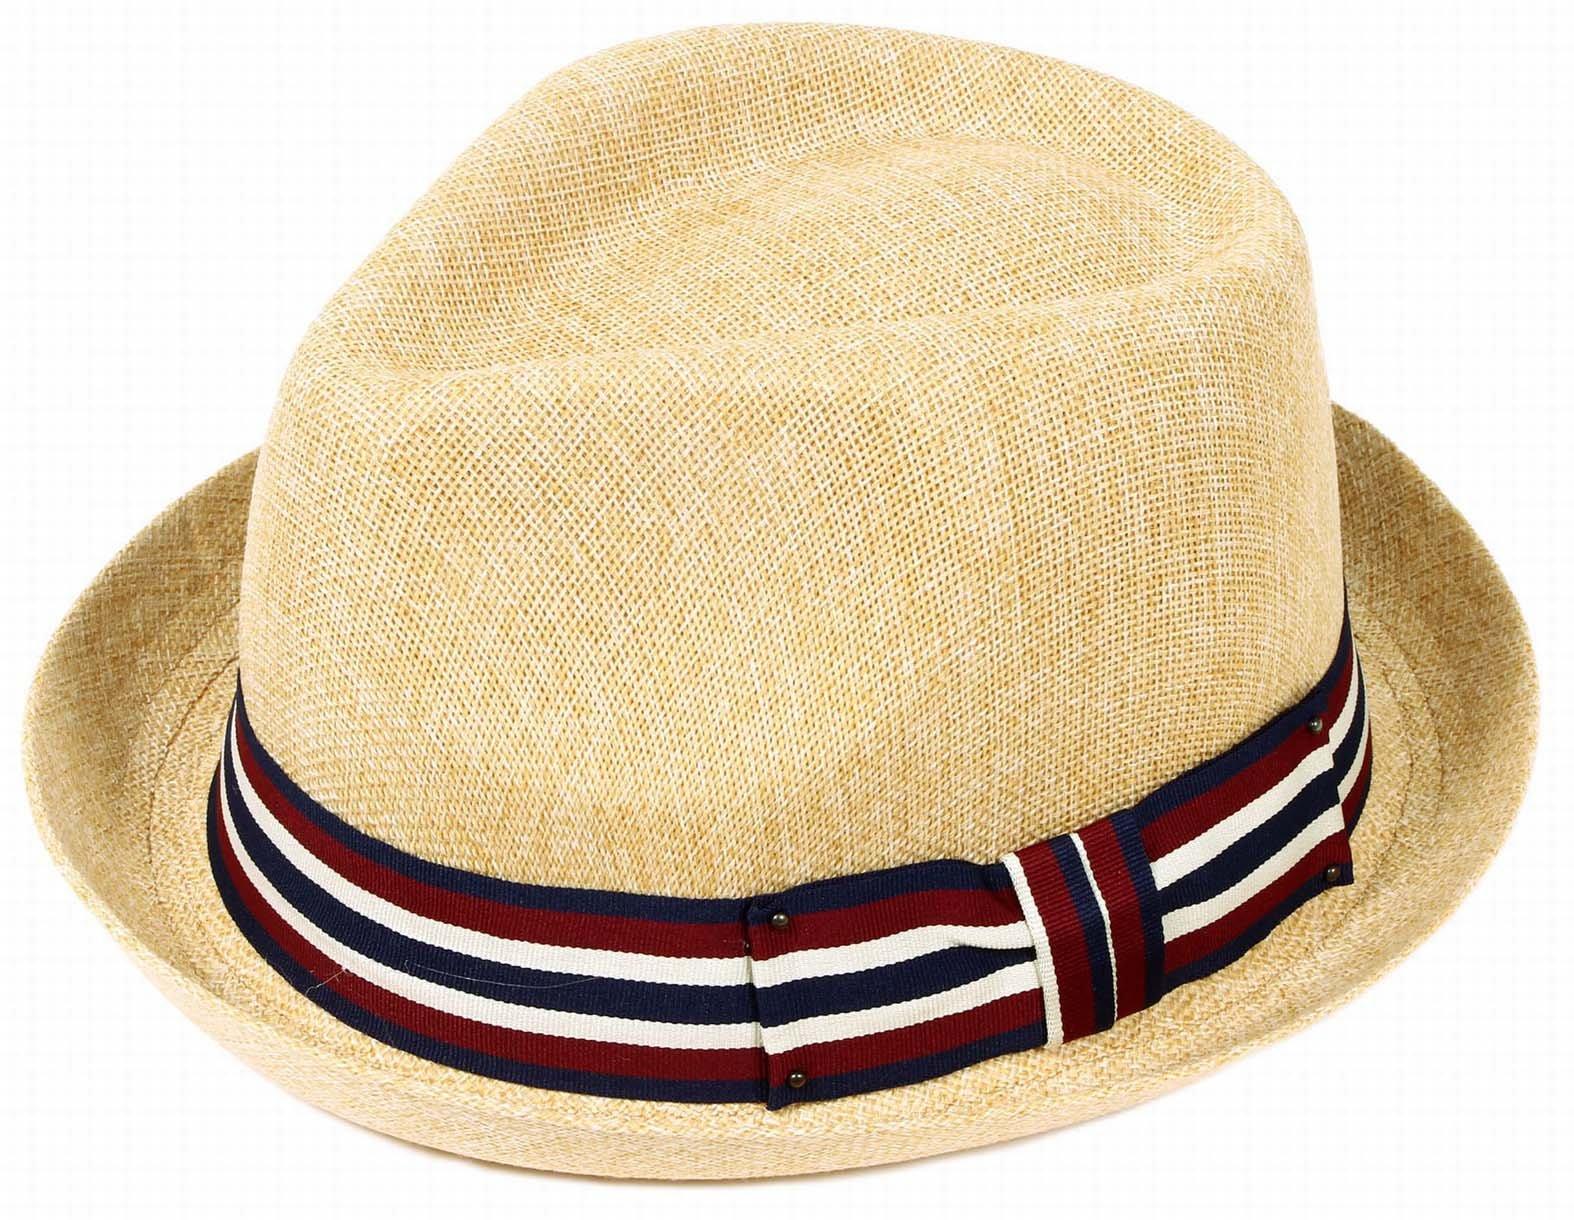 AshopZ Unisex Summer Outdoors Short Brim Straw Fedora Hat,Tan S/M